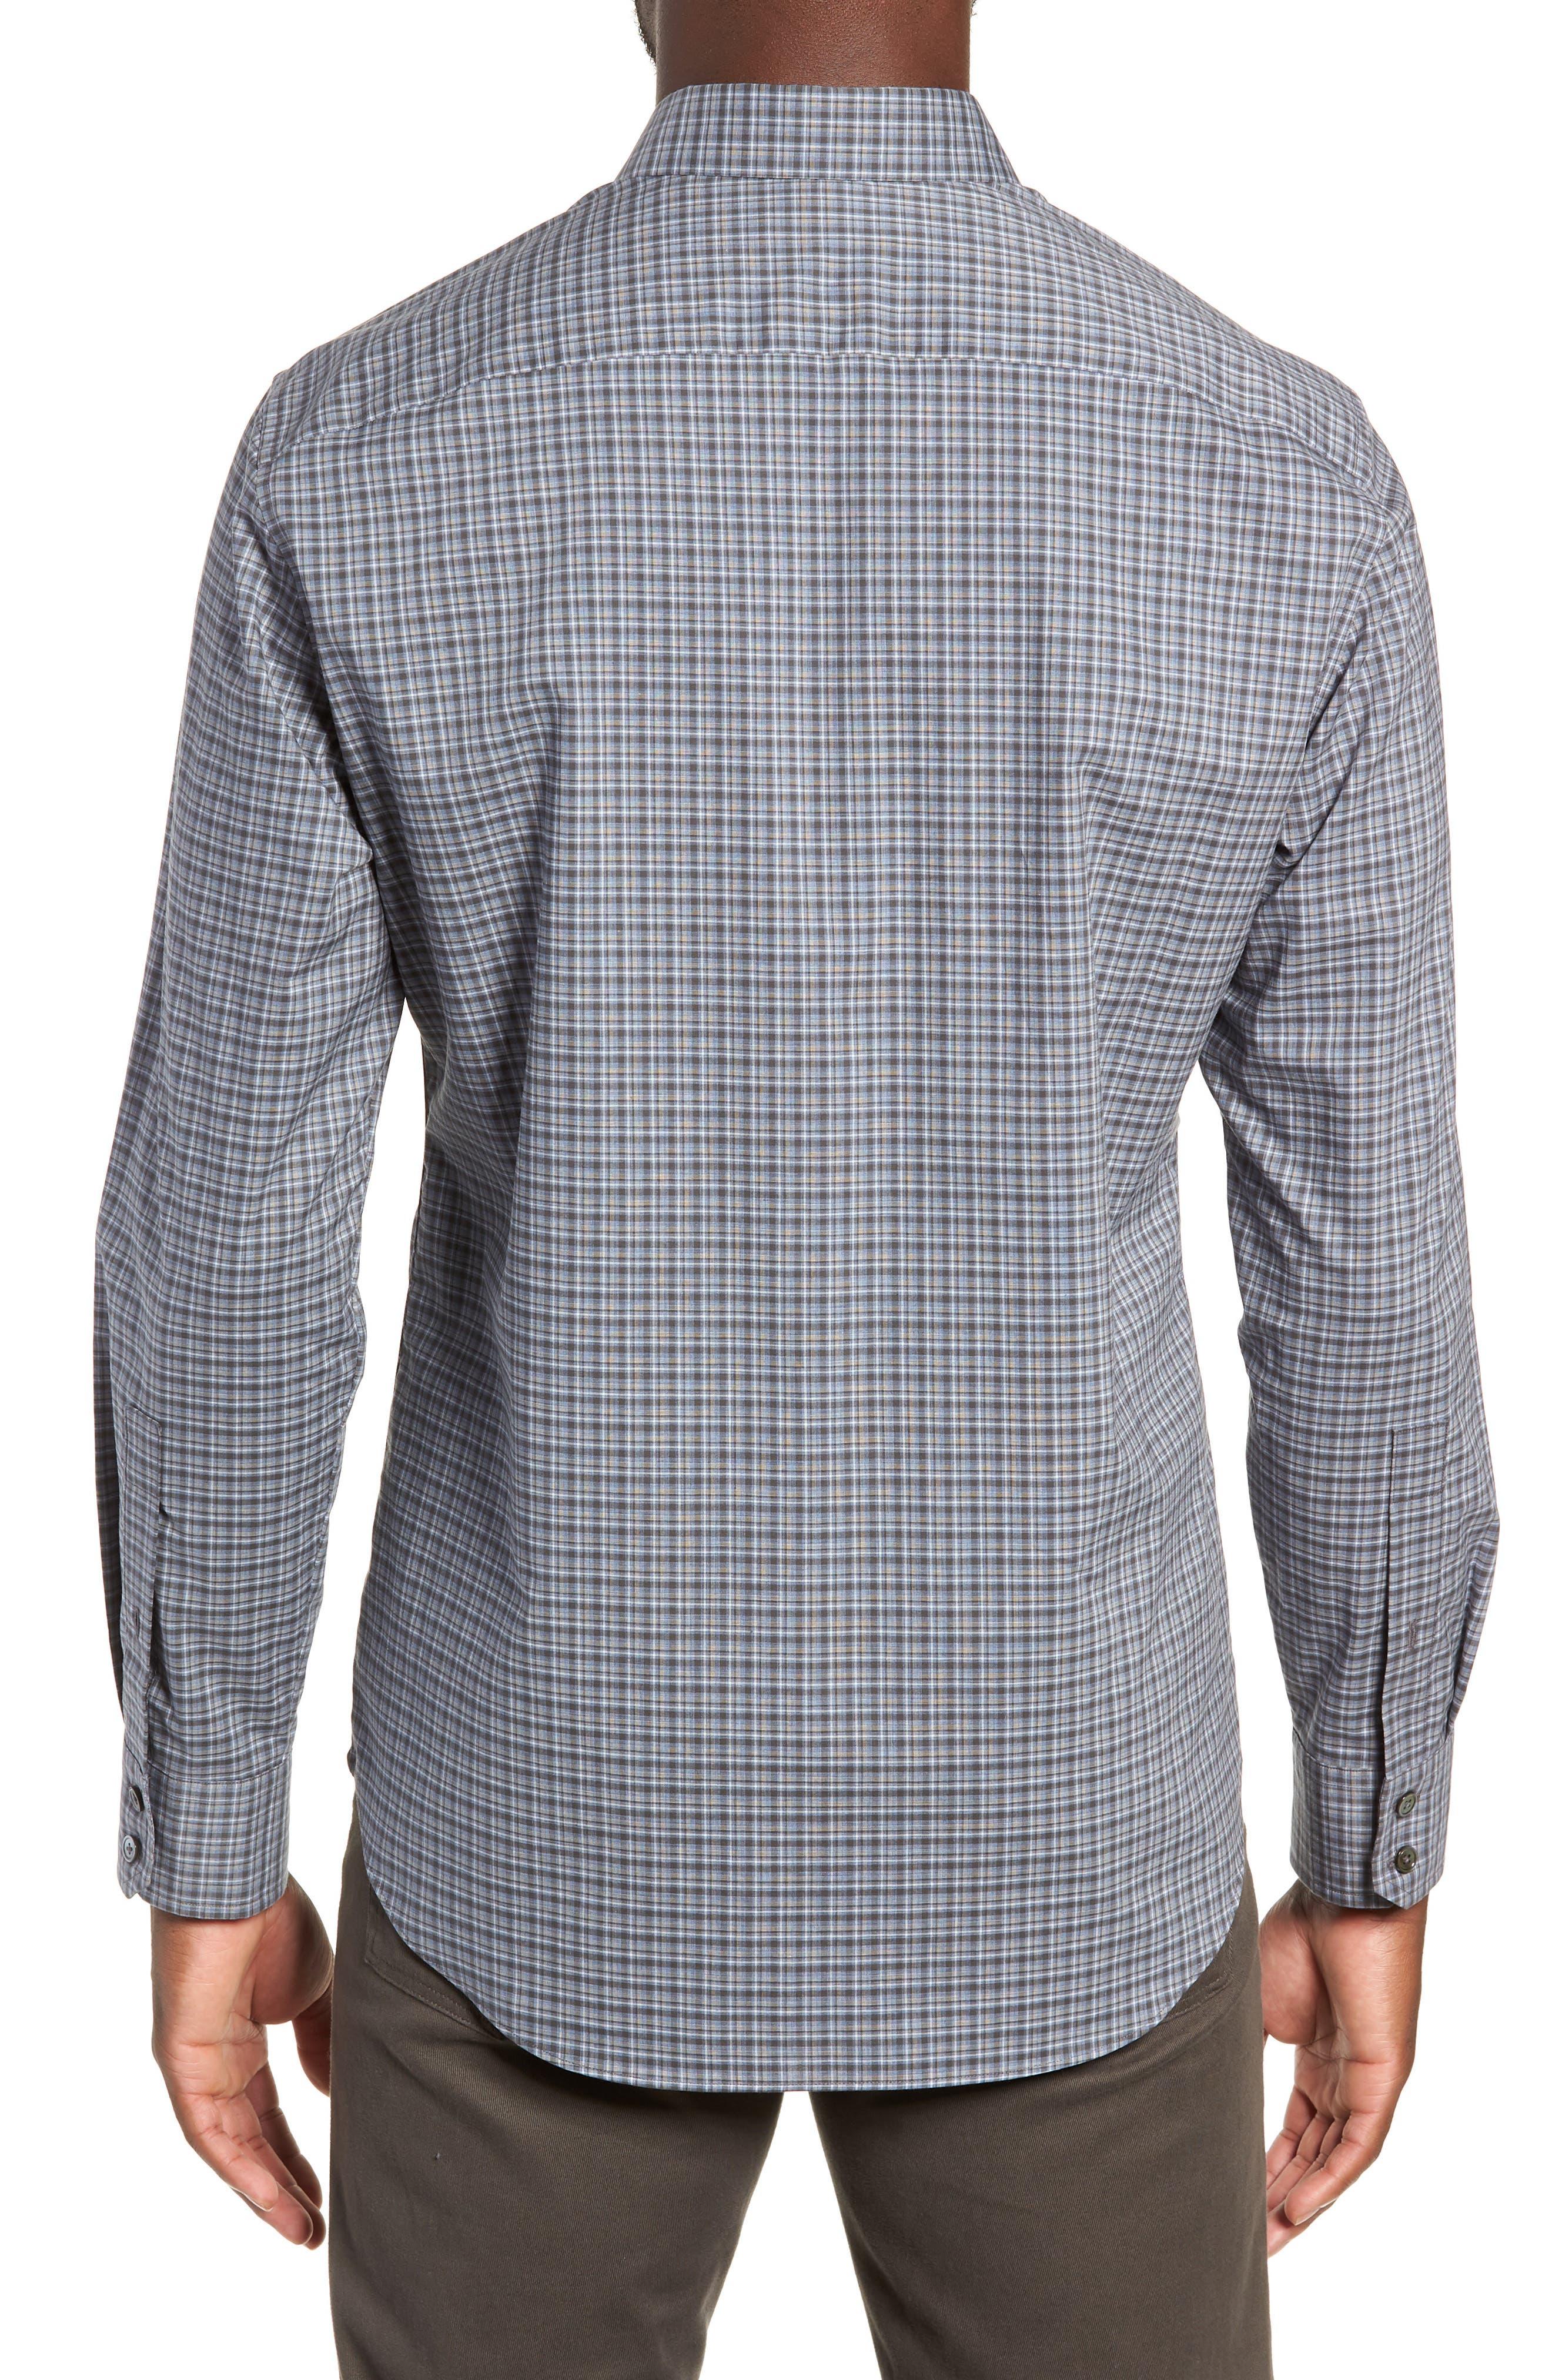 ZACHARY PRELL,                             Chu Regular Fit Plaid Sport Shirt,                             Alternate thumbnail 3, color,                             021